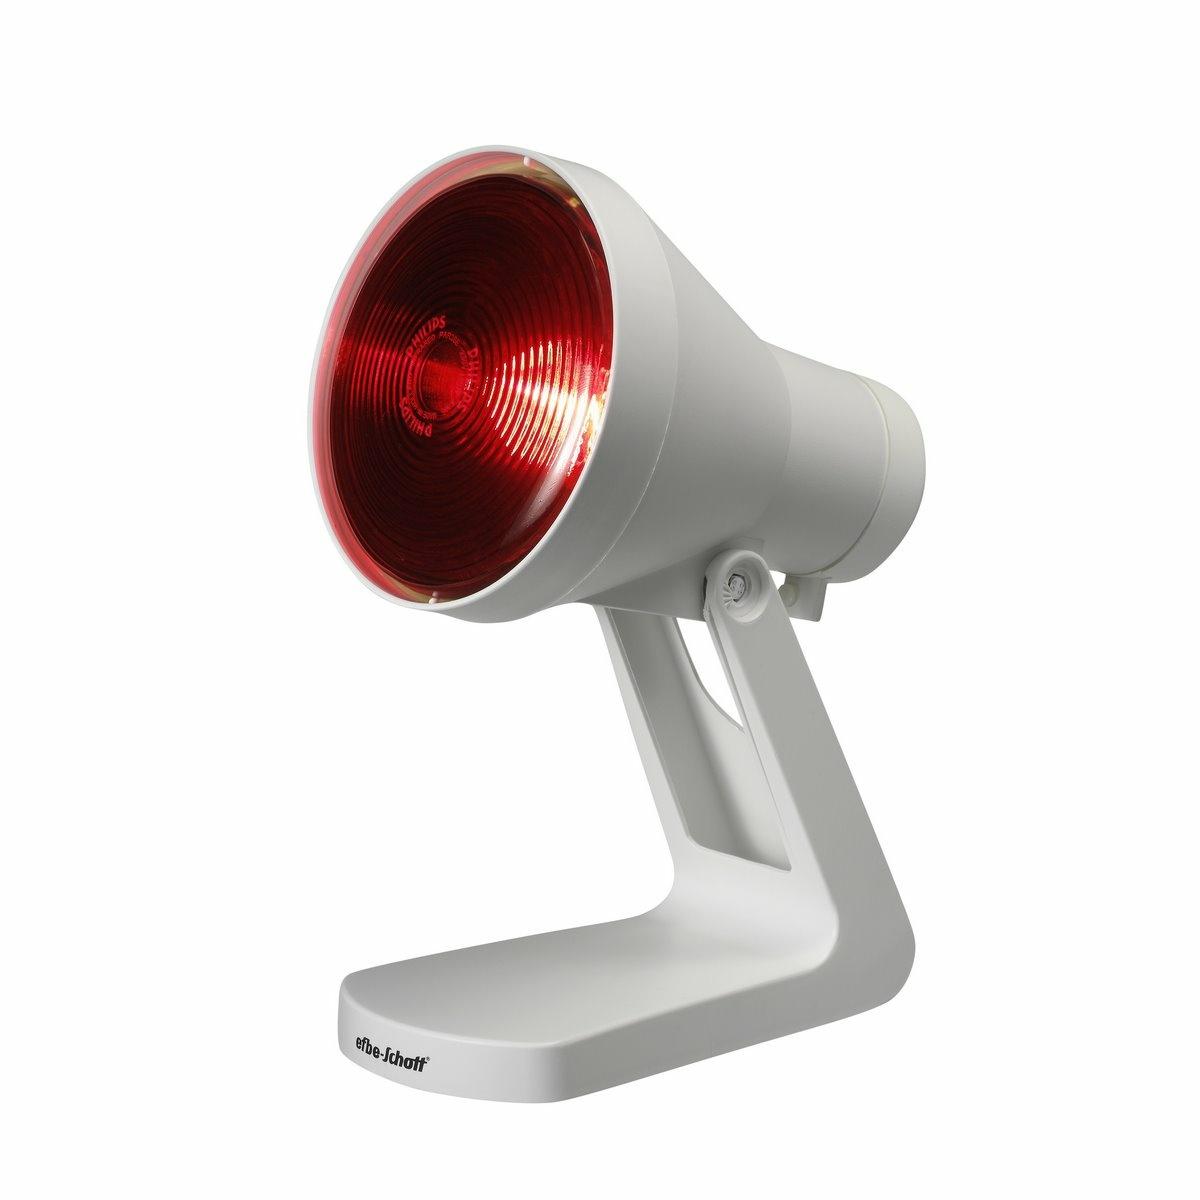 Lampă infraroșu EFBE-SCHOTT IR 812 cu becinfraroșu 150 W PHILIPS imagine 2021 e4home.ro